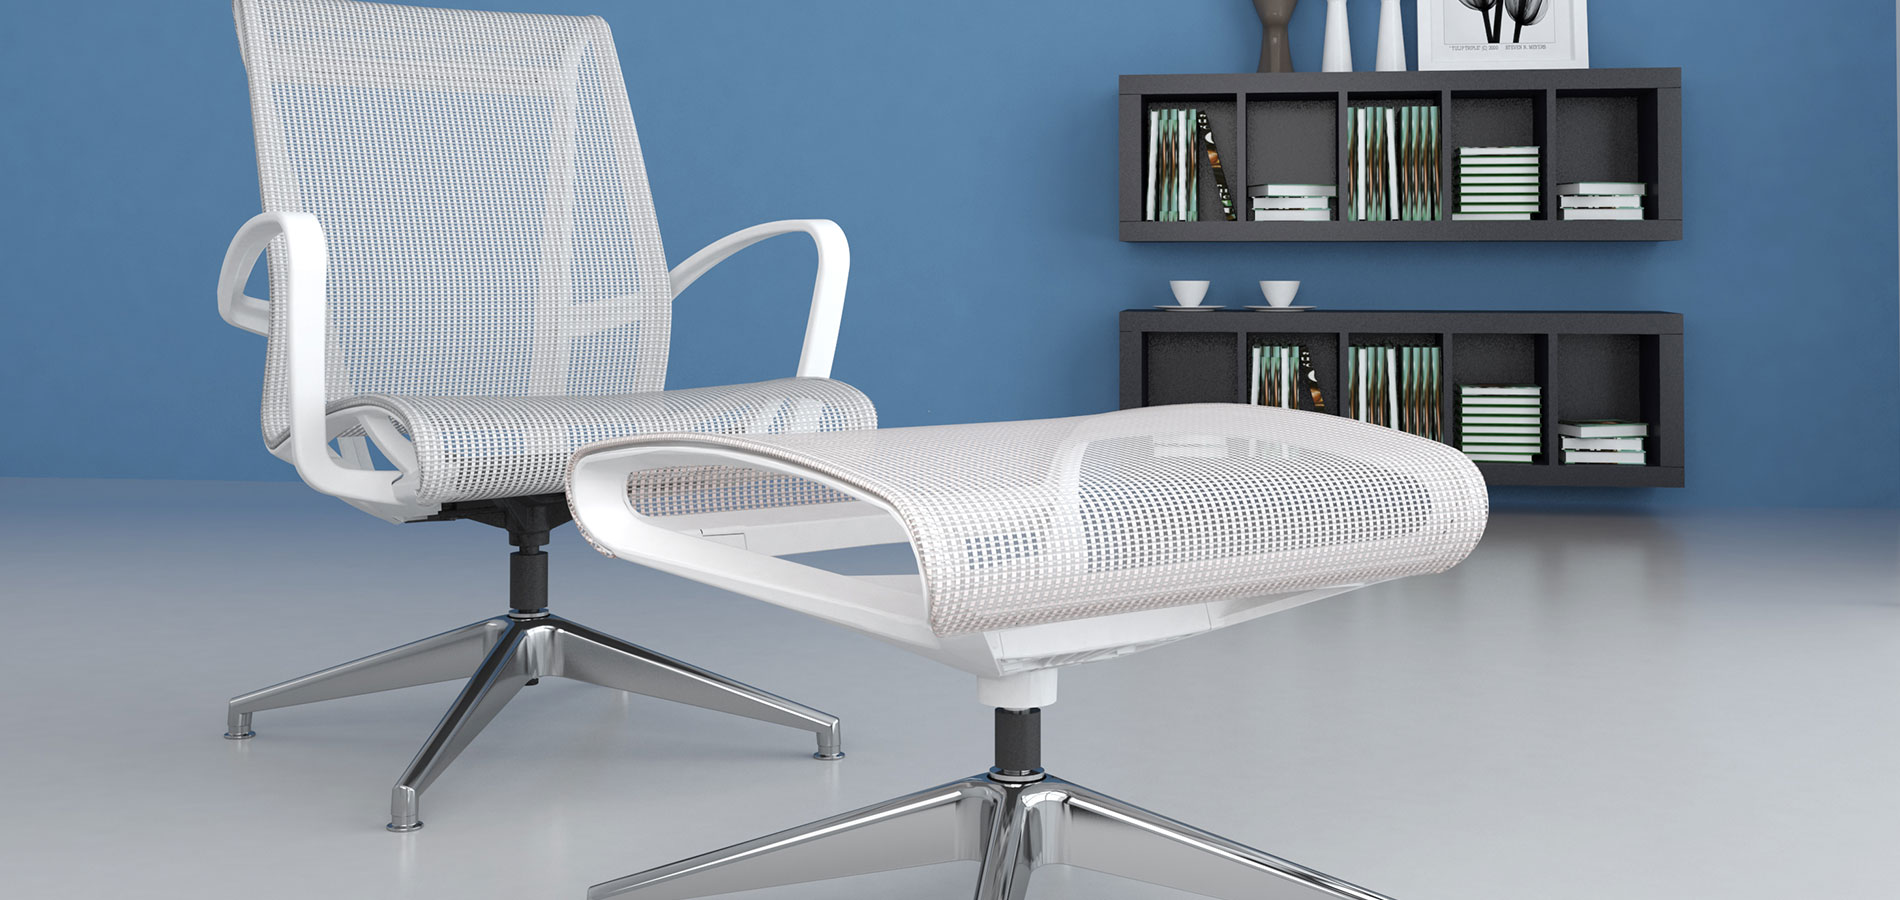 Innovative Marketing Group The Premier Contract Furniture Manufacturer  Representative